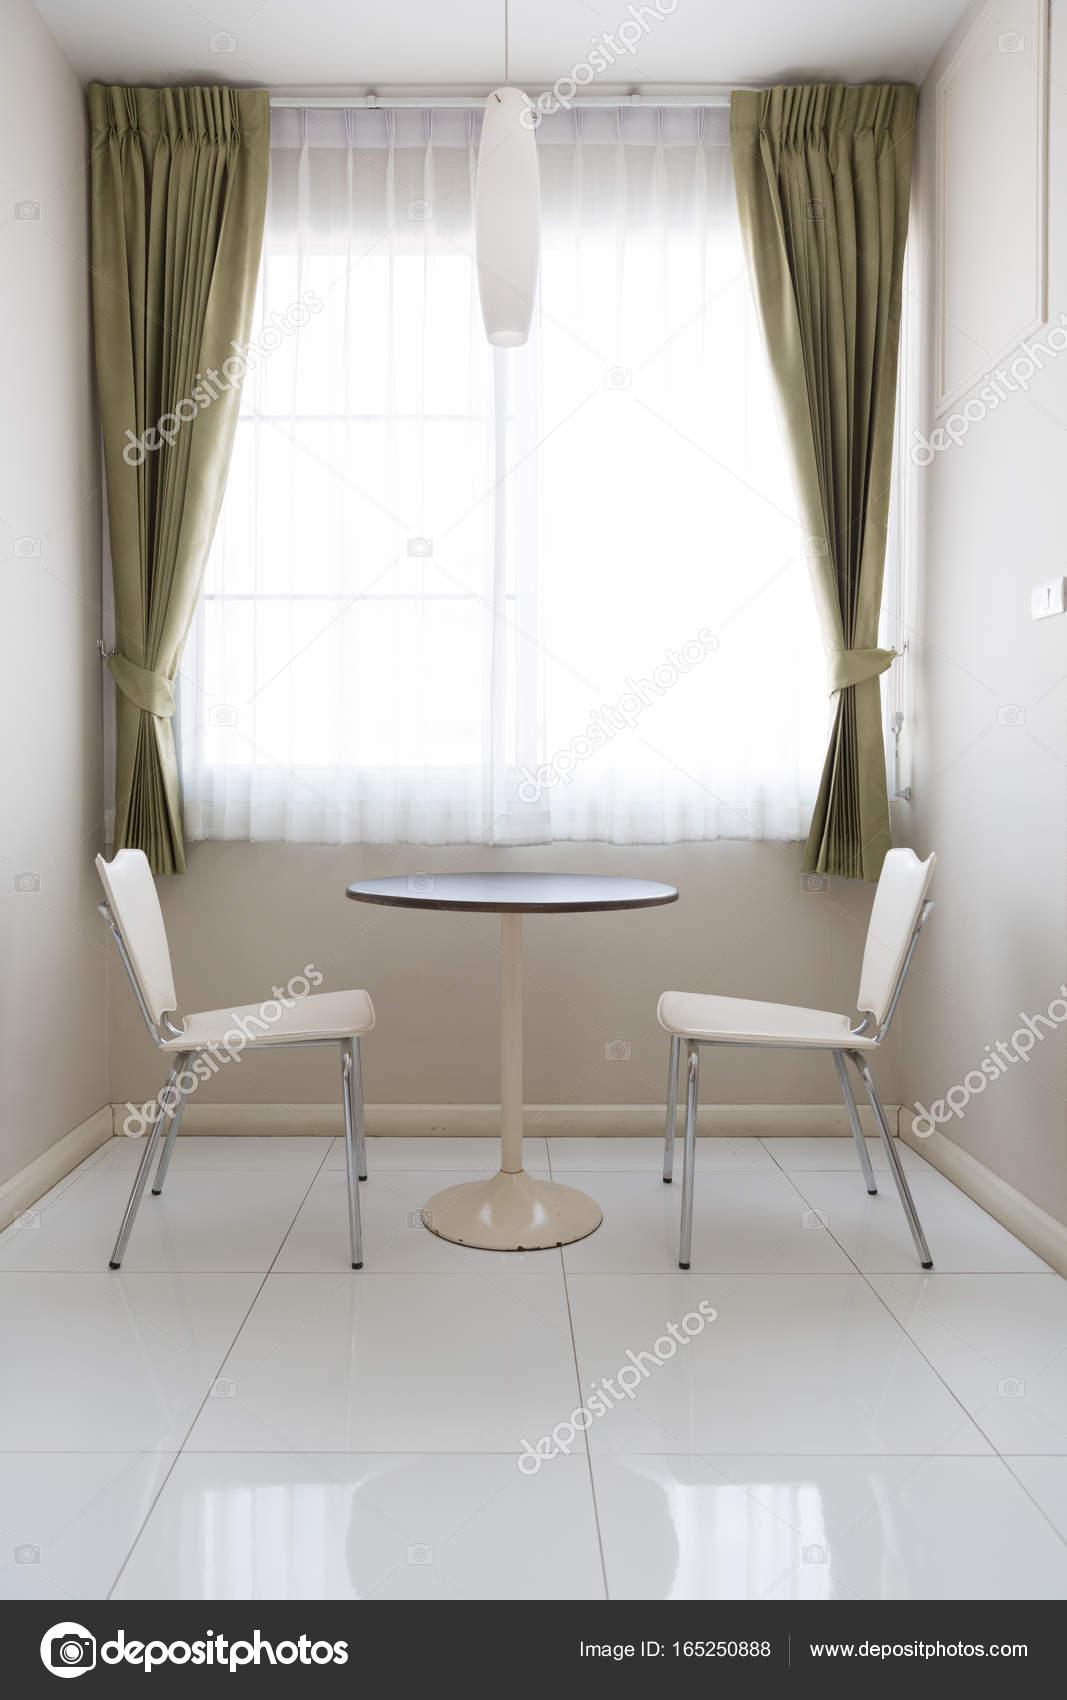 https://st3.depositphotos.com/2766632/16525/i/1600/depositphotos_165250888-stockafbeelding-interieur-kleine-eettafel-en-stoel.jpg